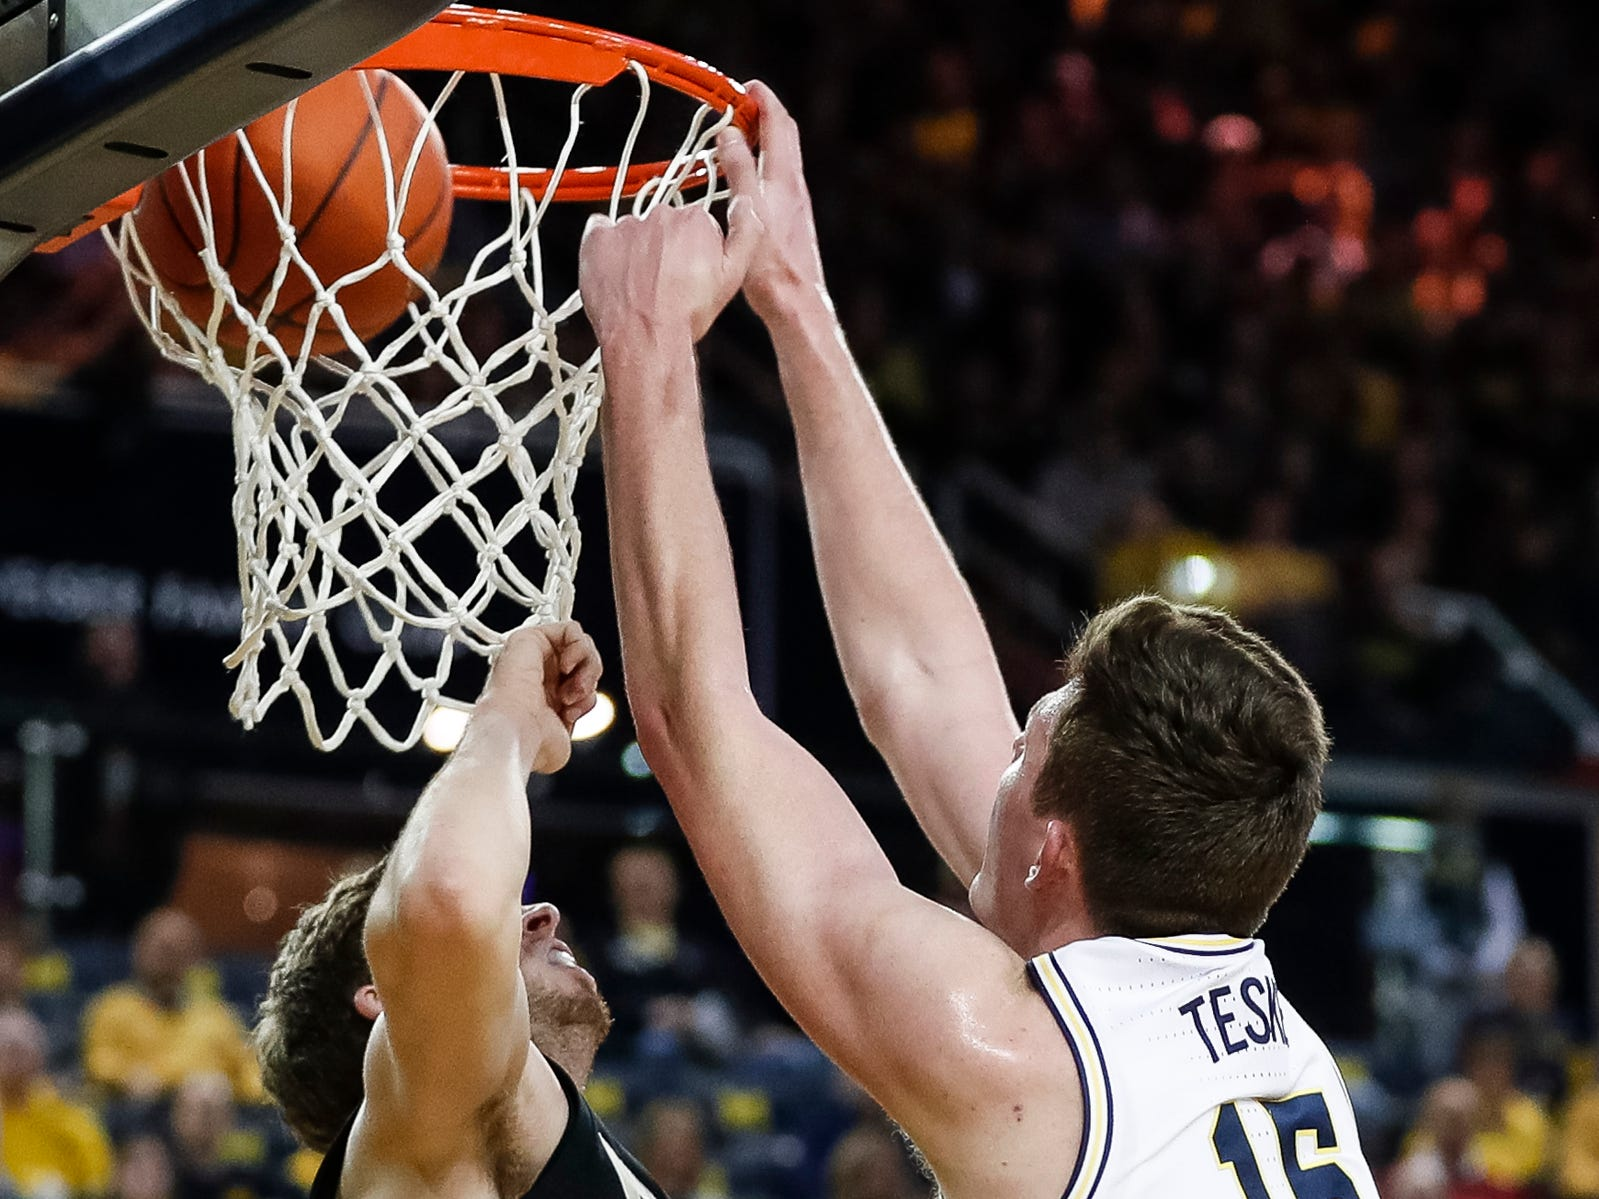 Michigan center Jon Teske (15)  dunks against Purdue guard Ryan Cline (14) during the first half at Crisler Center on Saturday, Dec. 1, 2018.